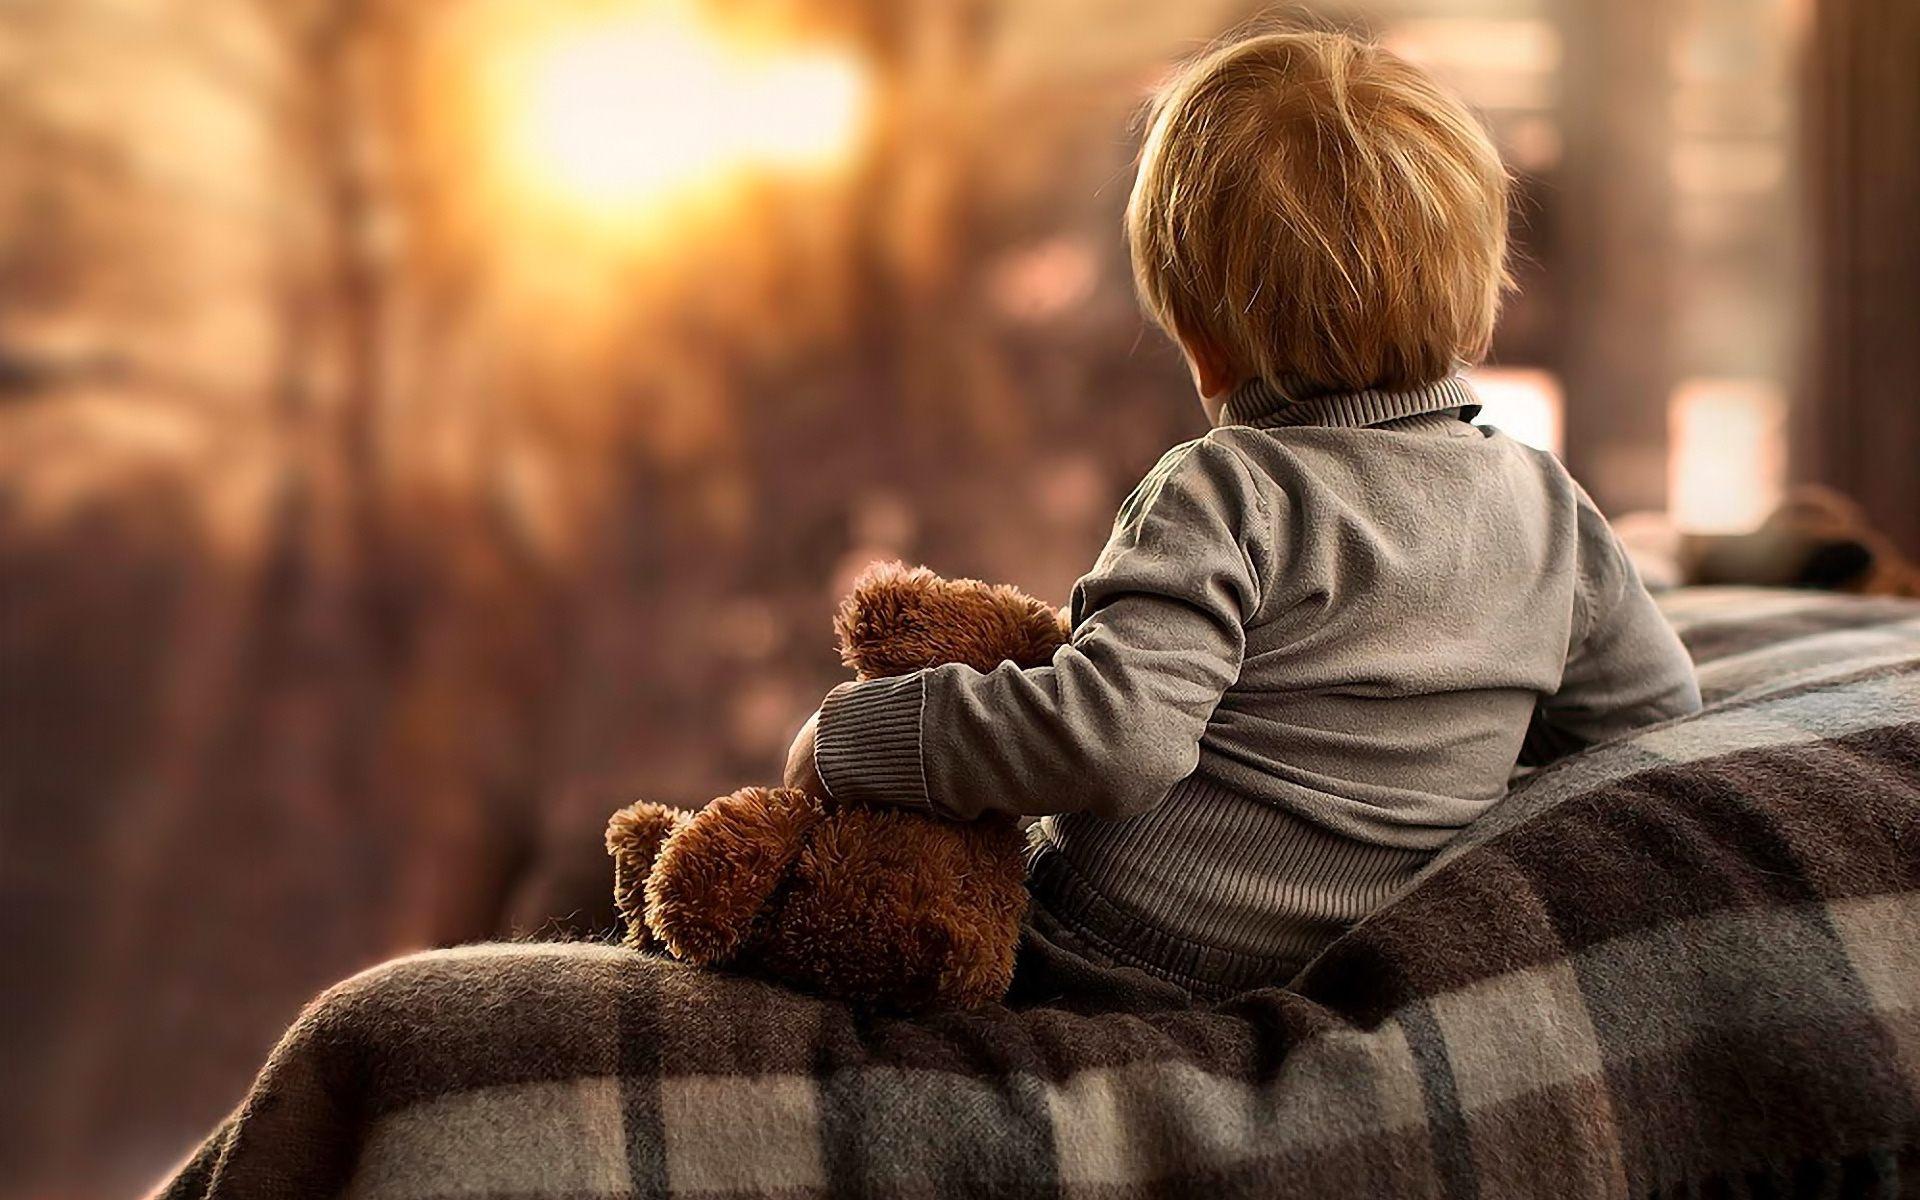 Cute Little Kid Wallpapers Filhos Abandonados Dentro Da Pr 243 Pria Casa